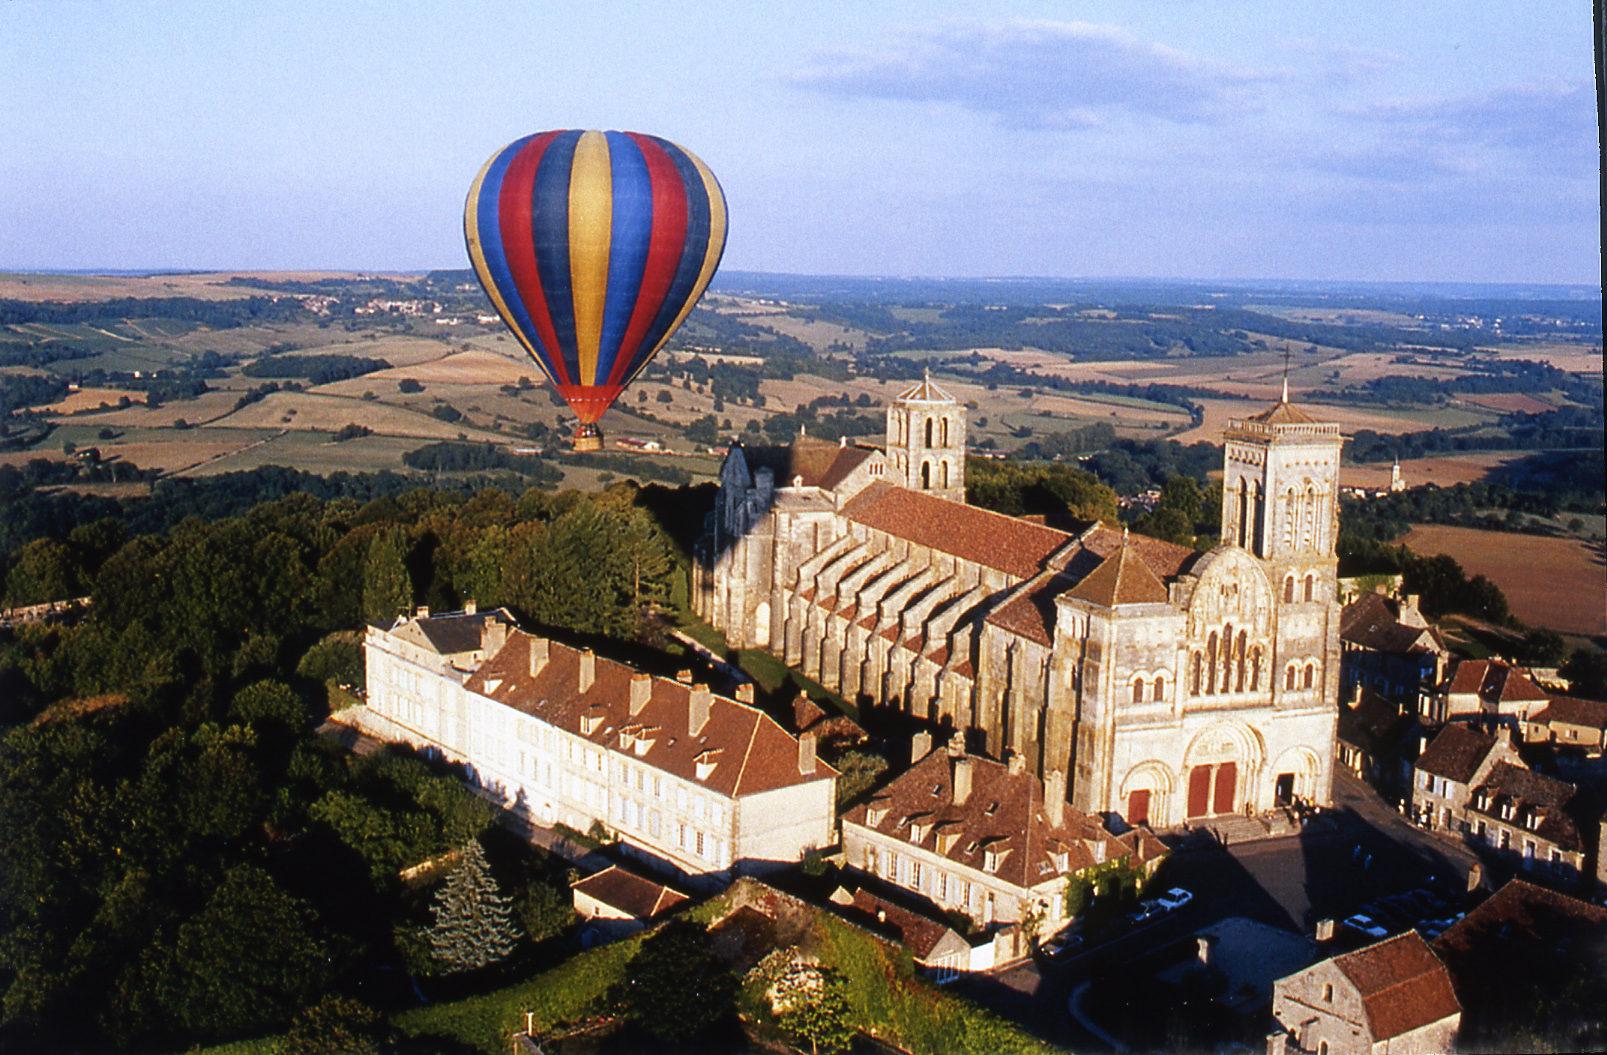 Fly over Vézelay